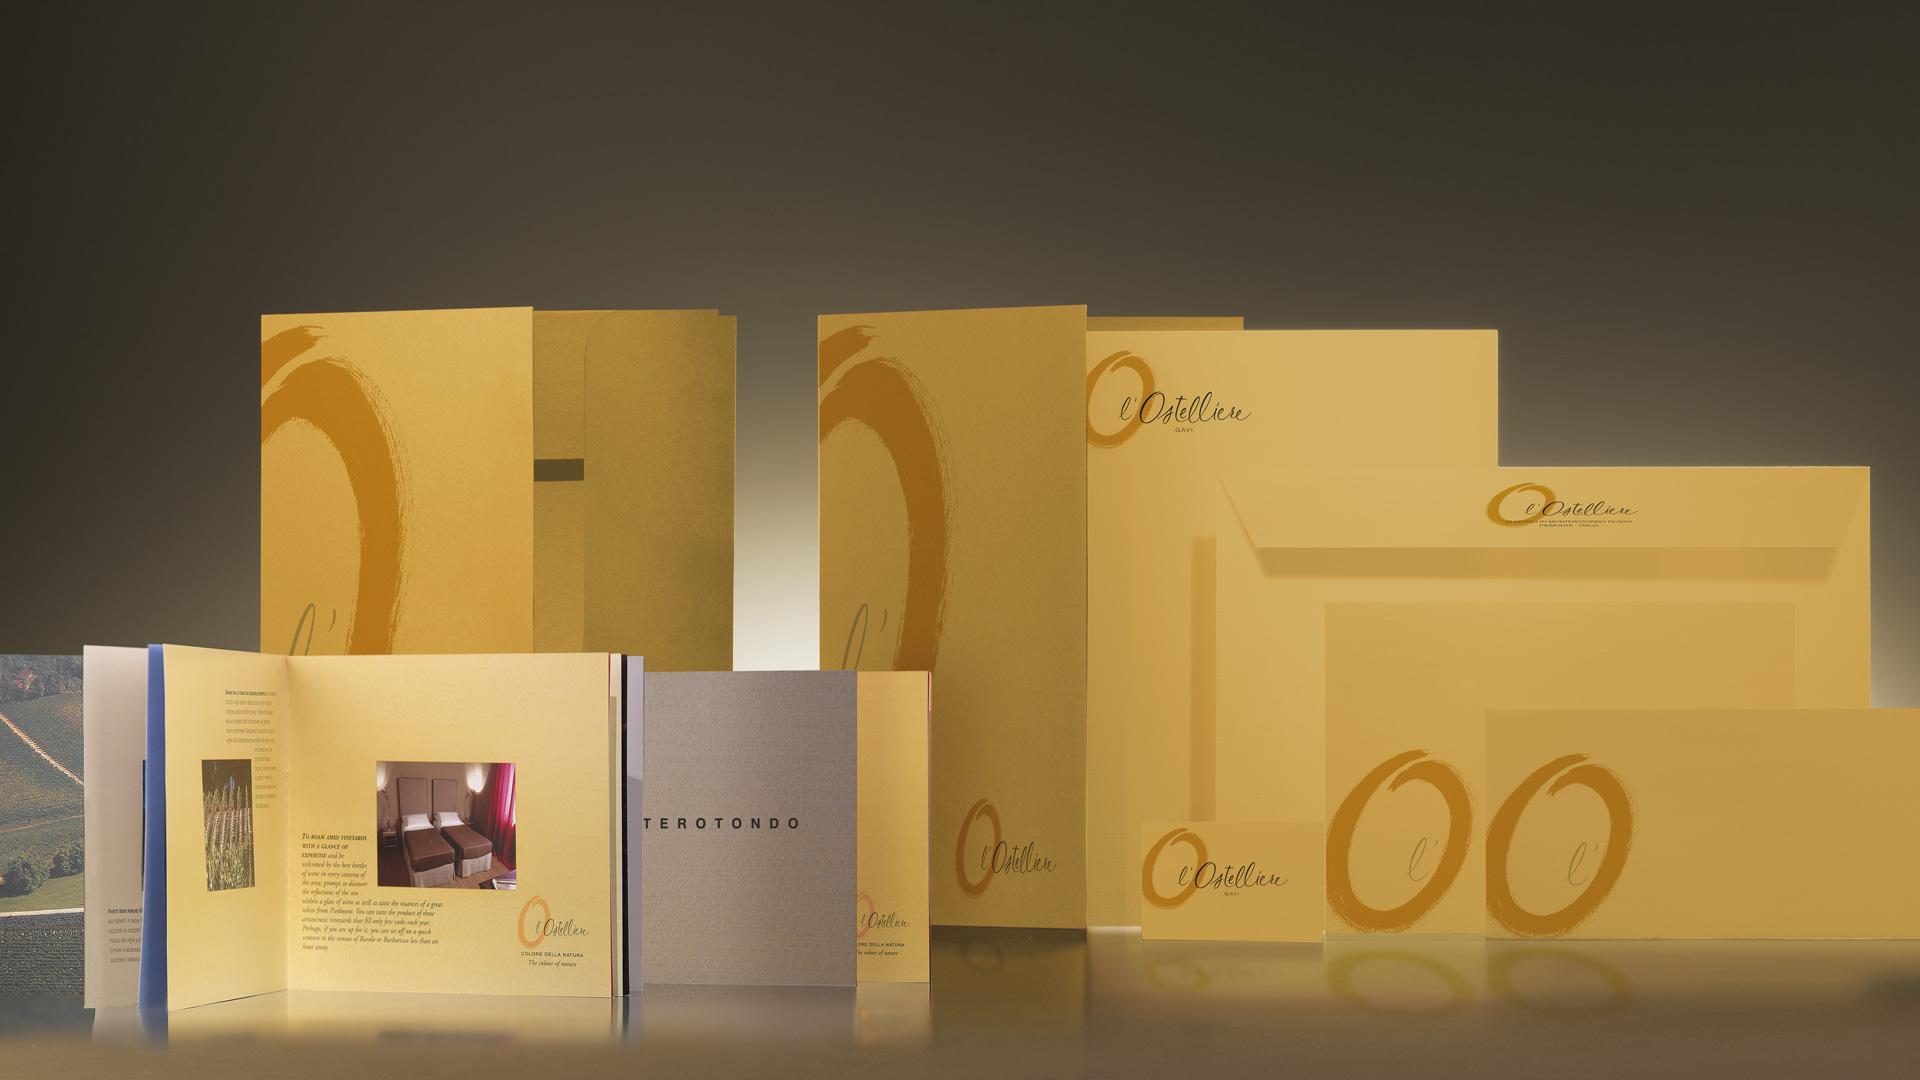 Villa Sparina Ostelliere coordinati global design